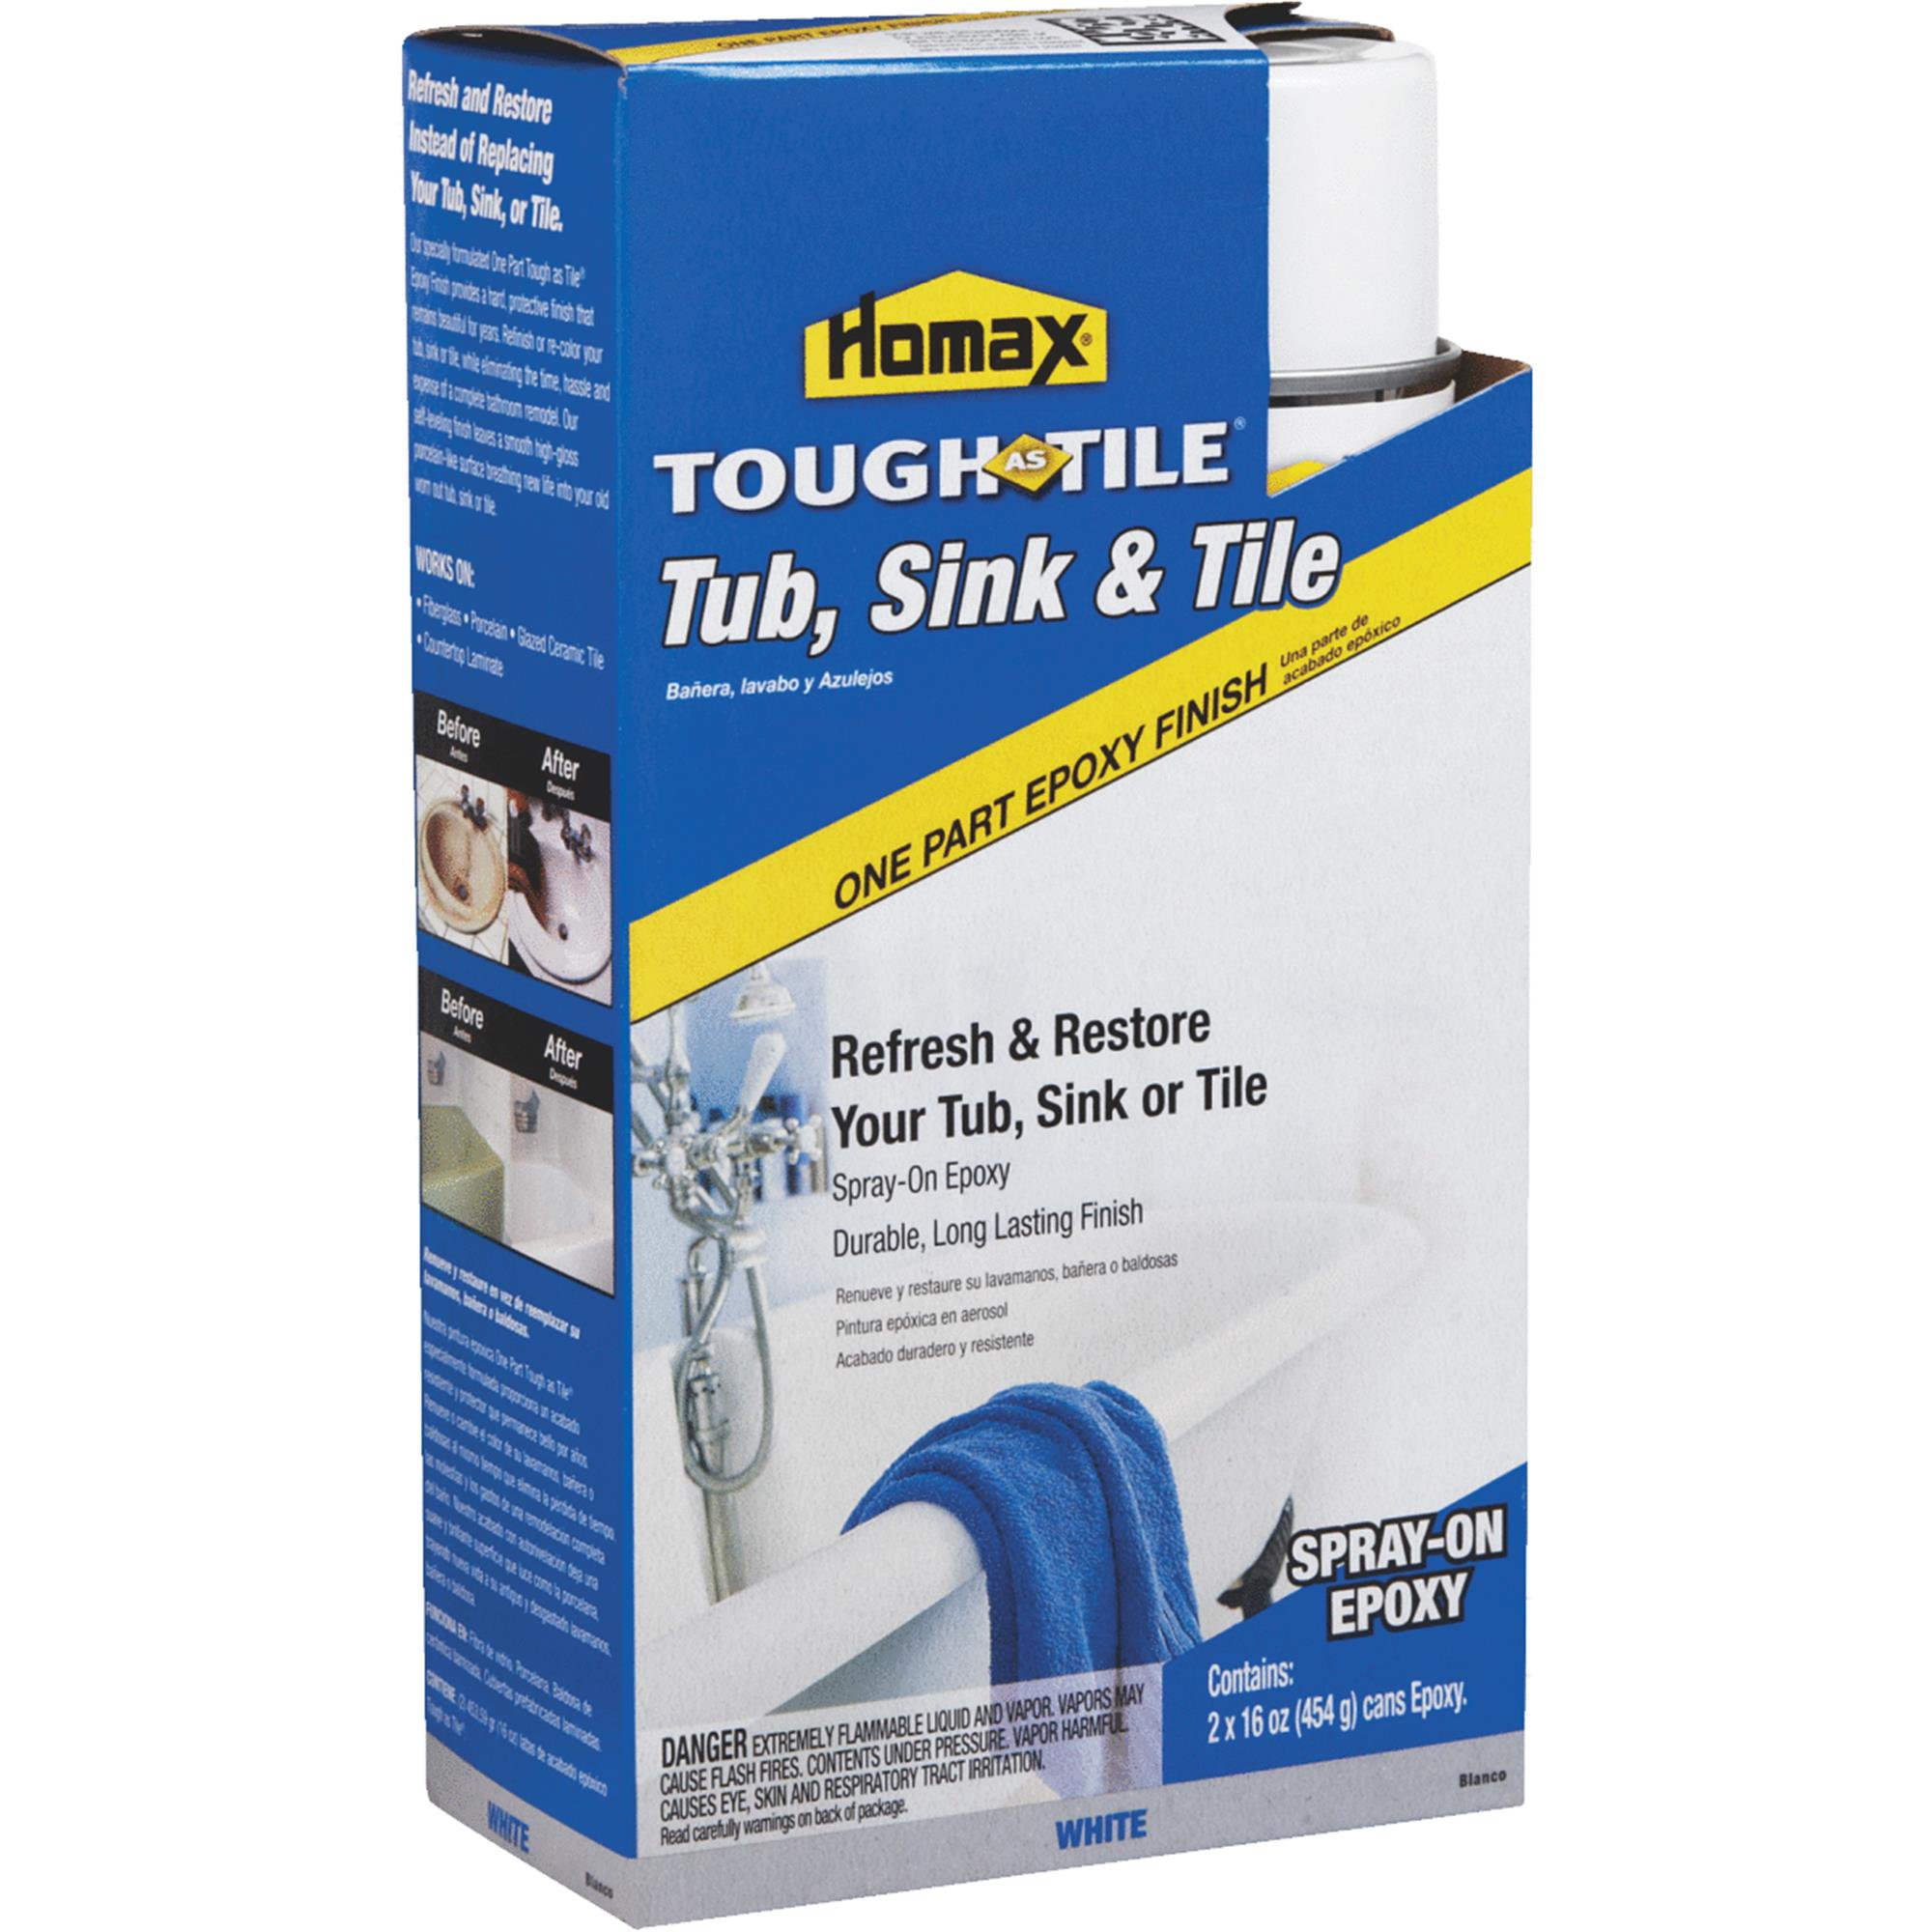 Cool Homax Tough as Tile Epoxy Tub & Tile Spray Paint Minimalist - Contemporary epoxy tub paint Model